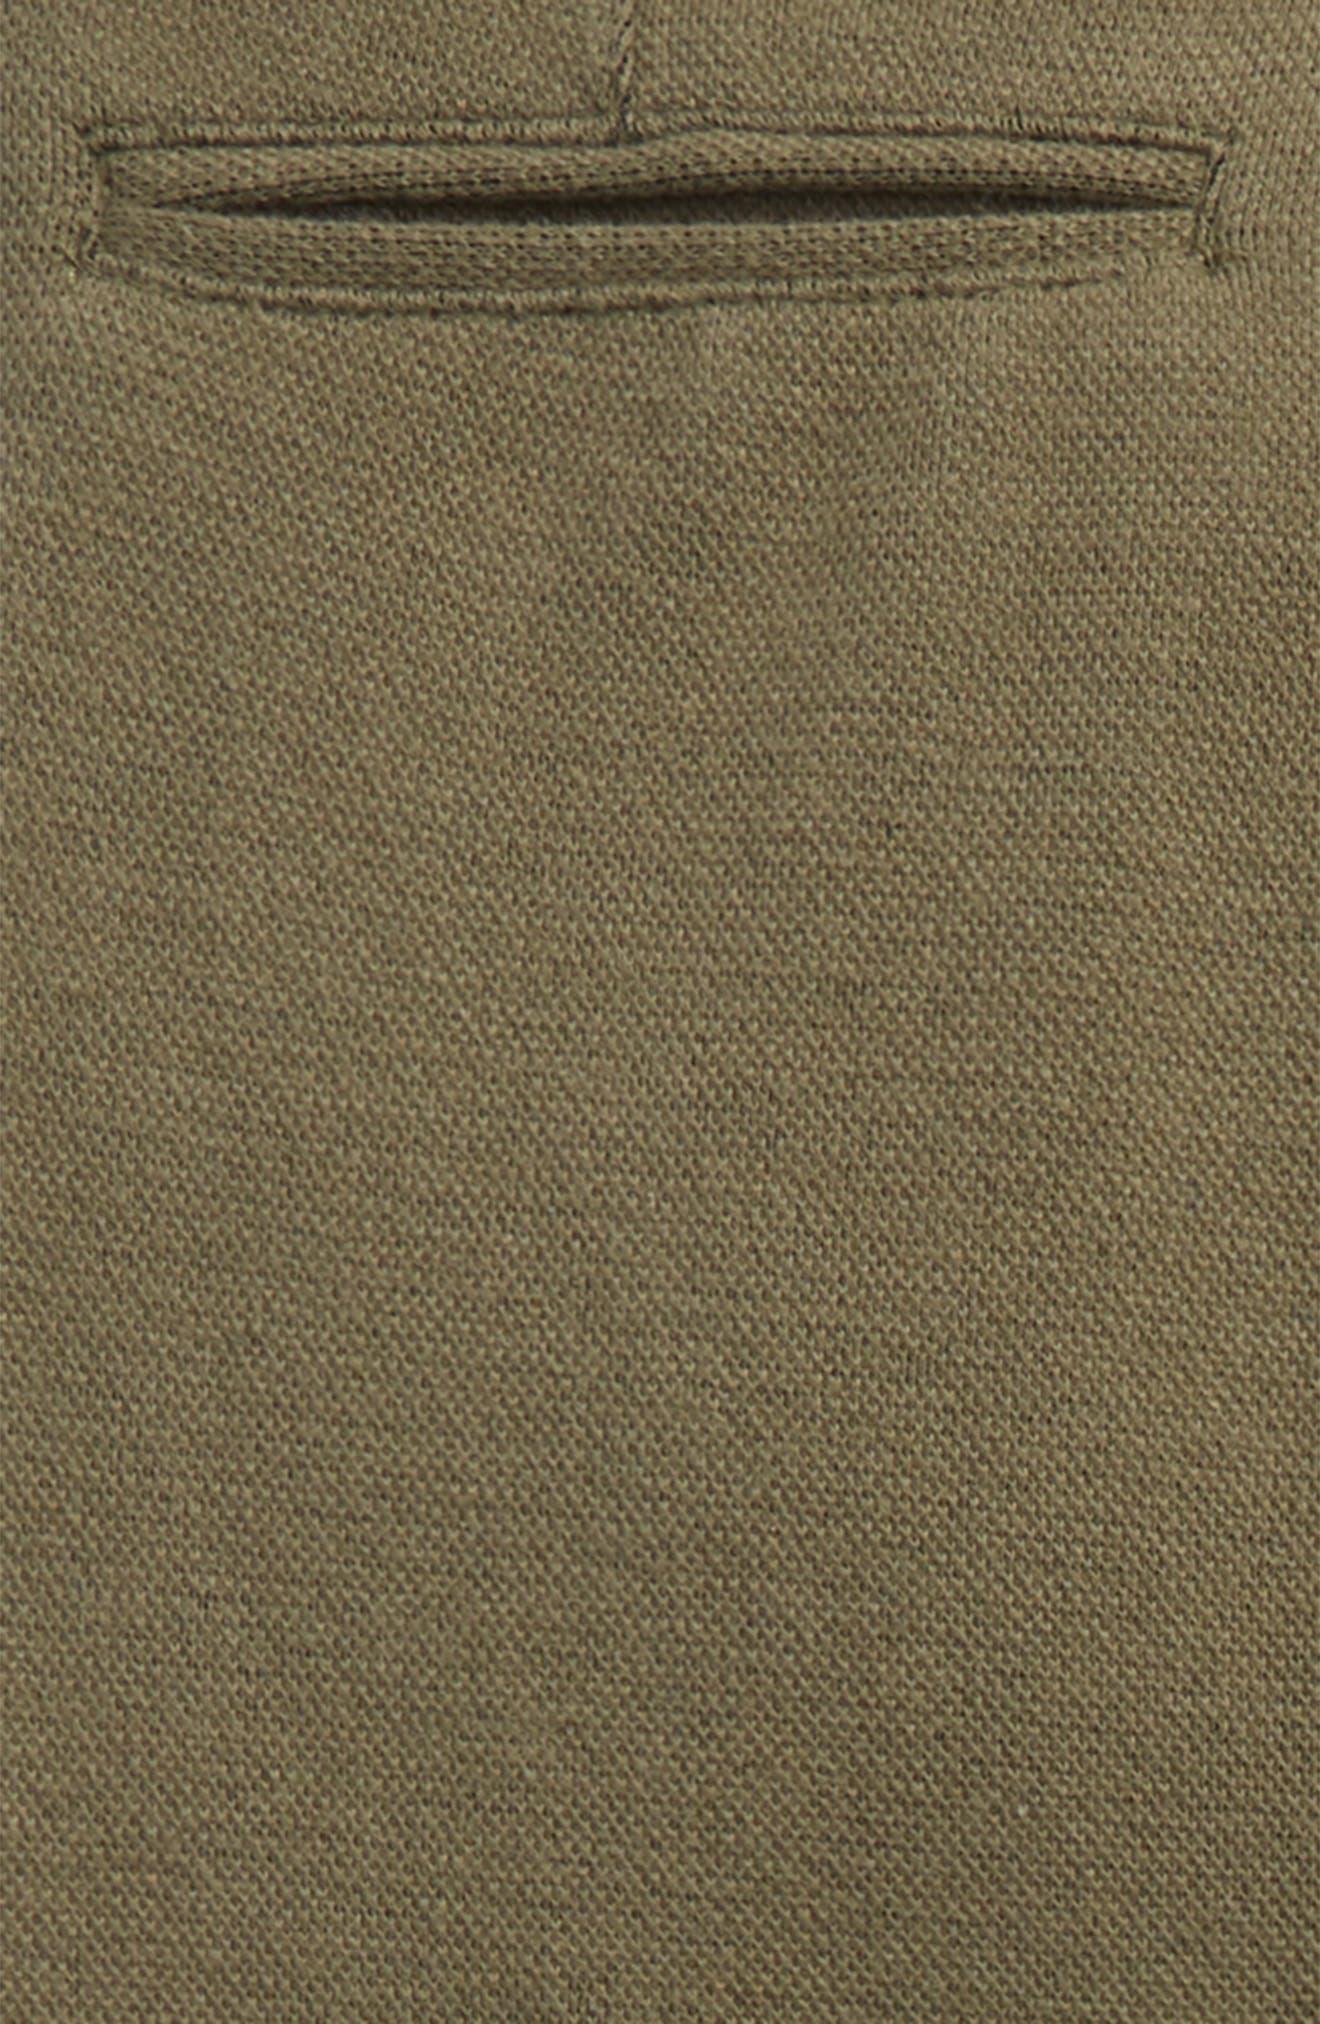 Jersey Chino Pants,                             Alternate thumbnail 3, color,                             304